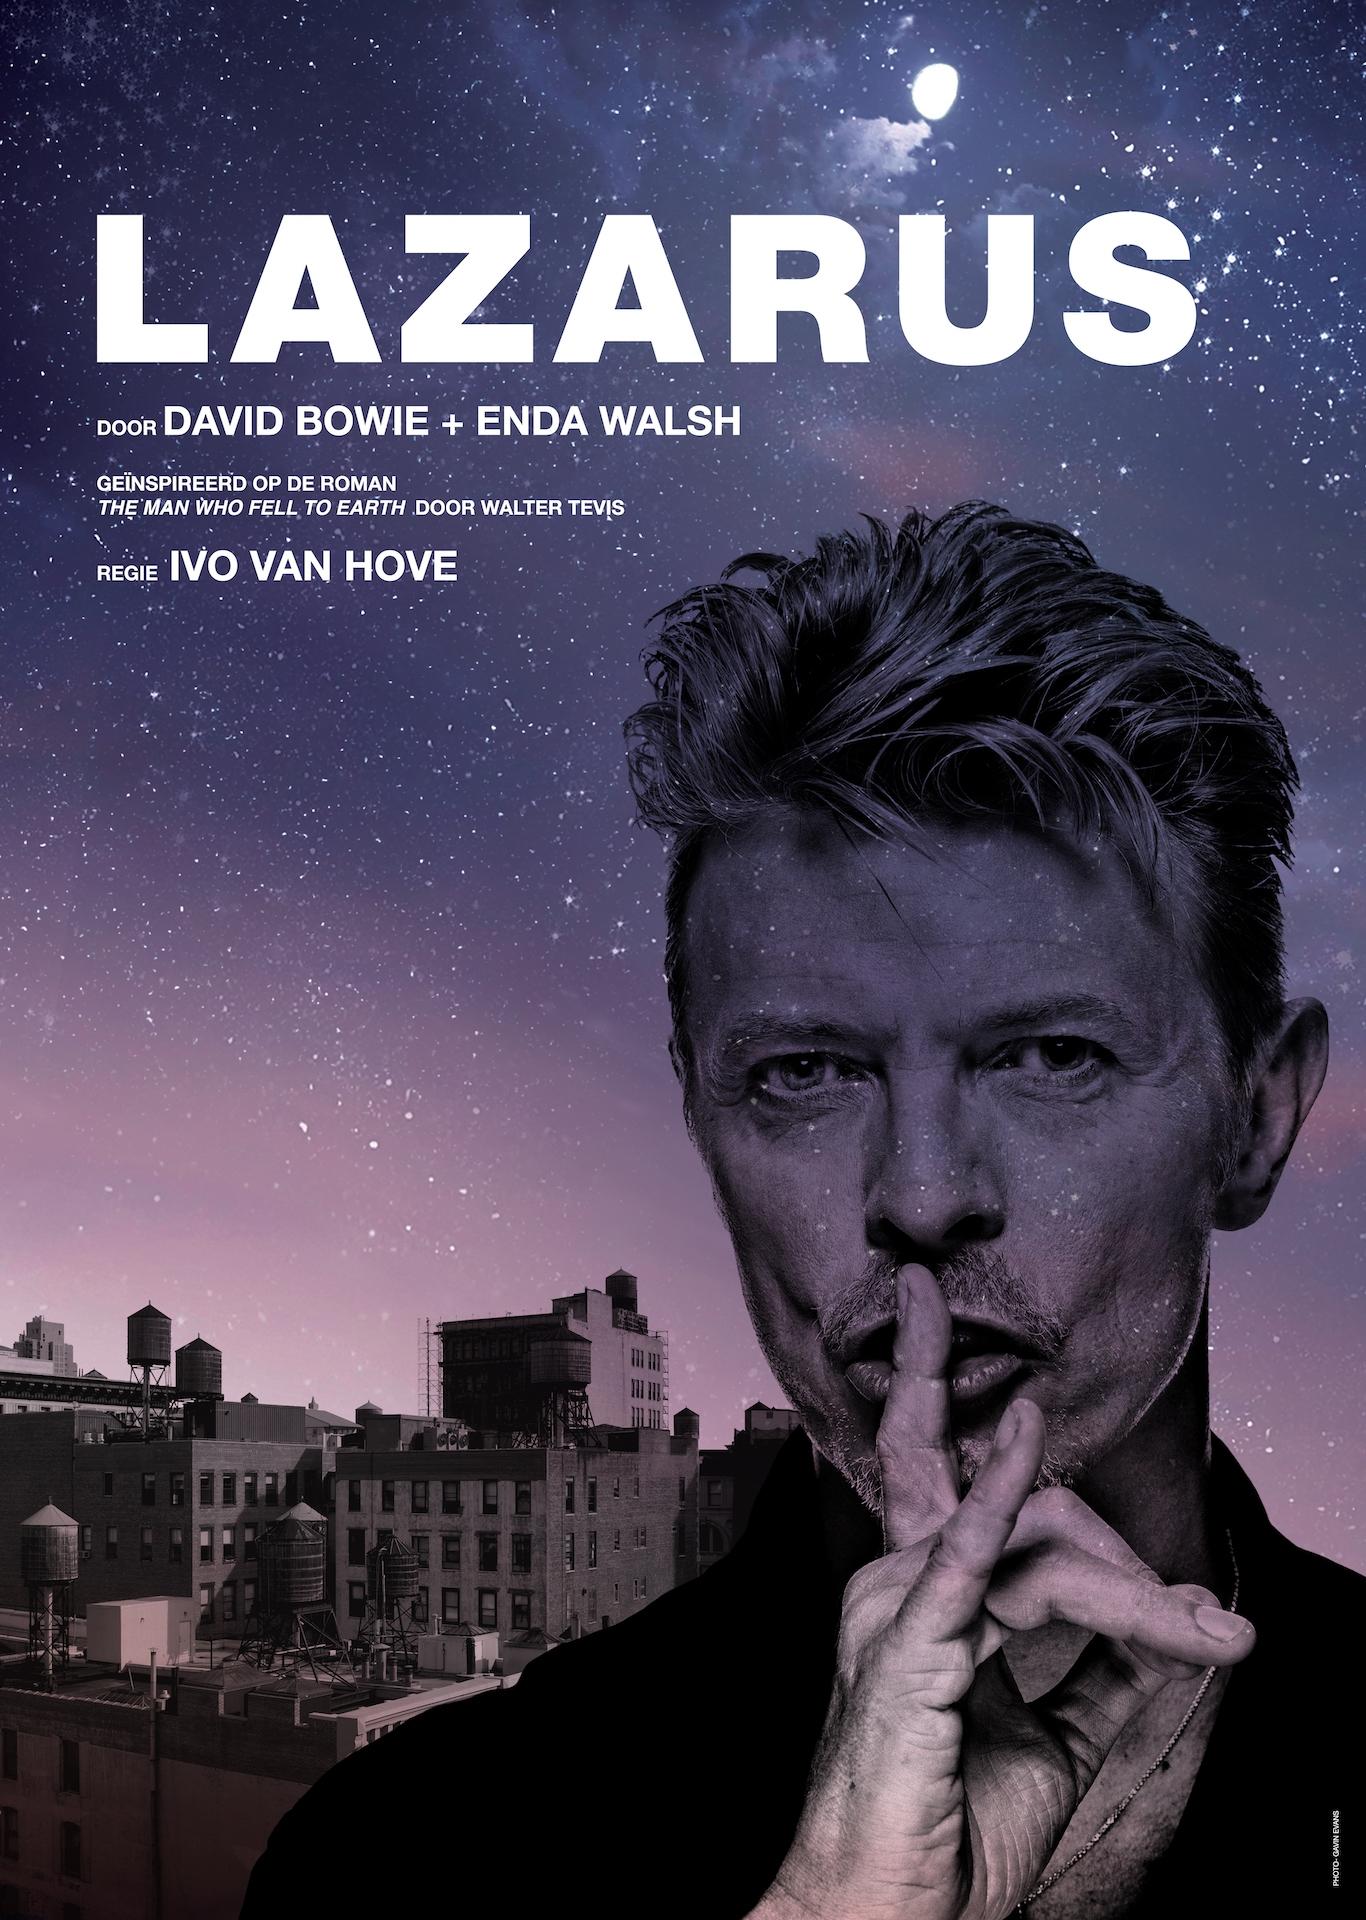 Amsterdamse kerkklokken eren David Bowie